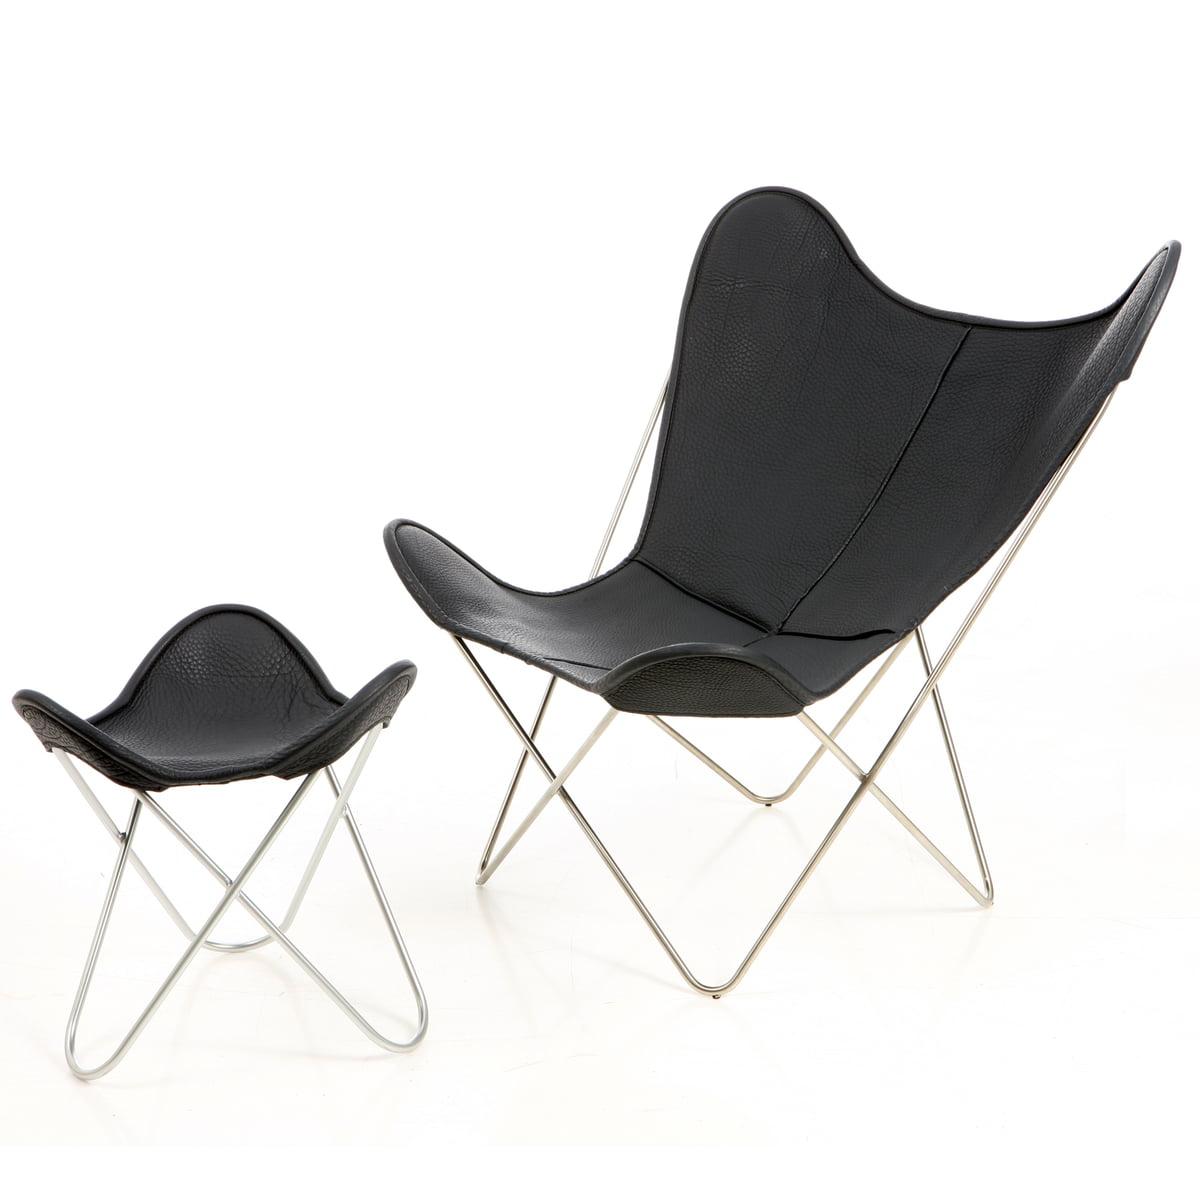 chaise butterfly b k f manufakturplus cuir. Black Bedroom Furniture Sets. Home Design Ideas